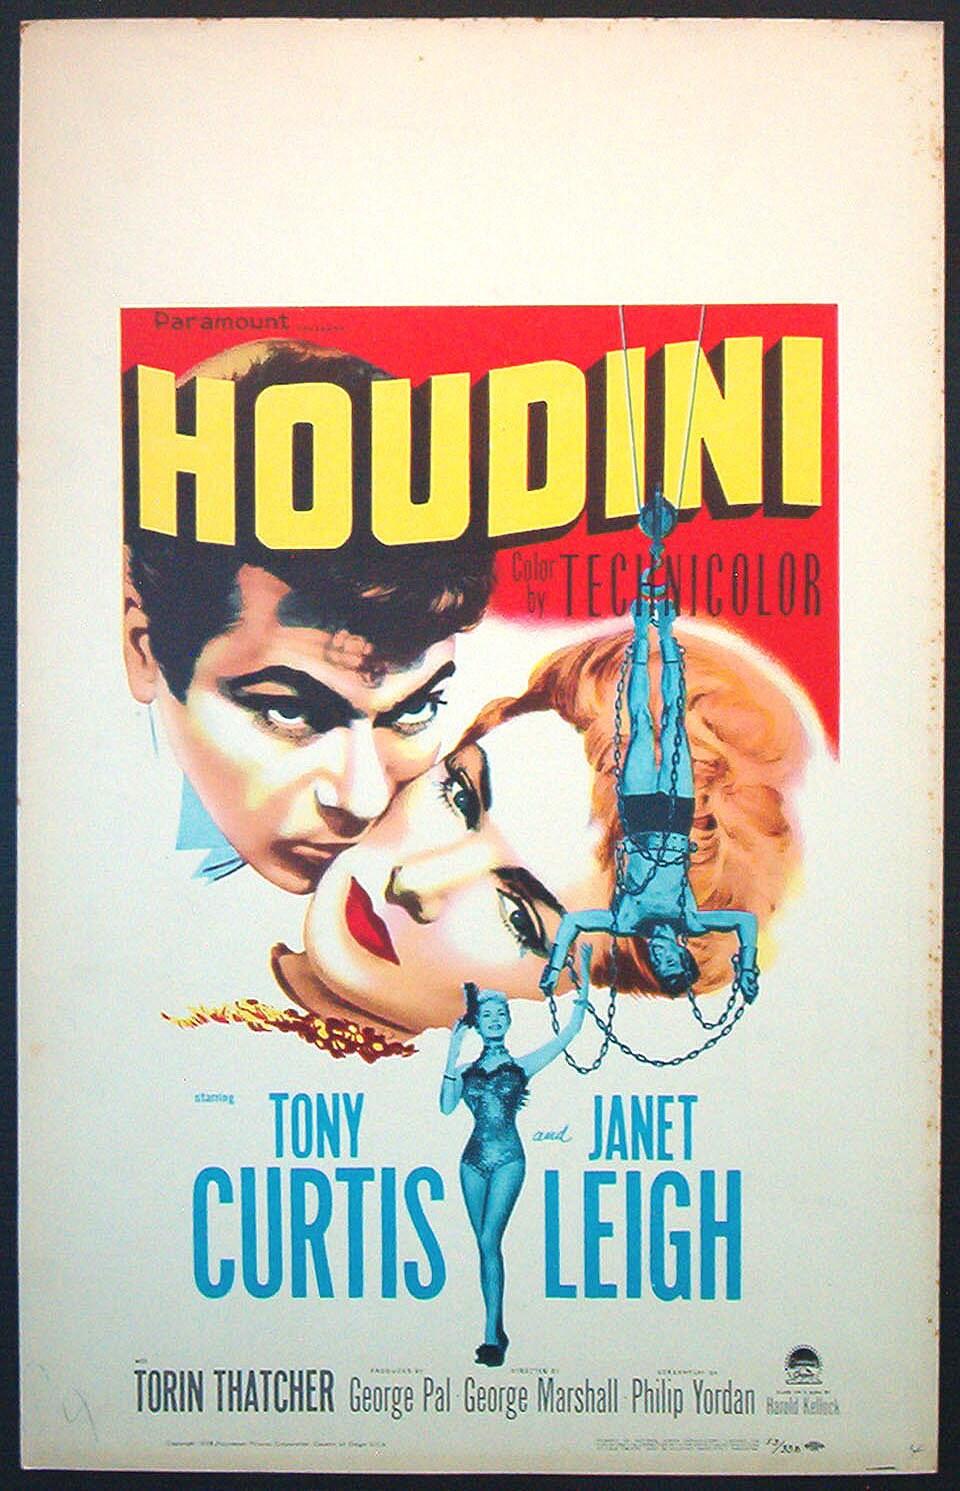 Houdini movie poster